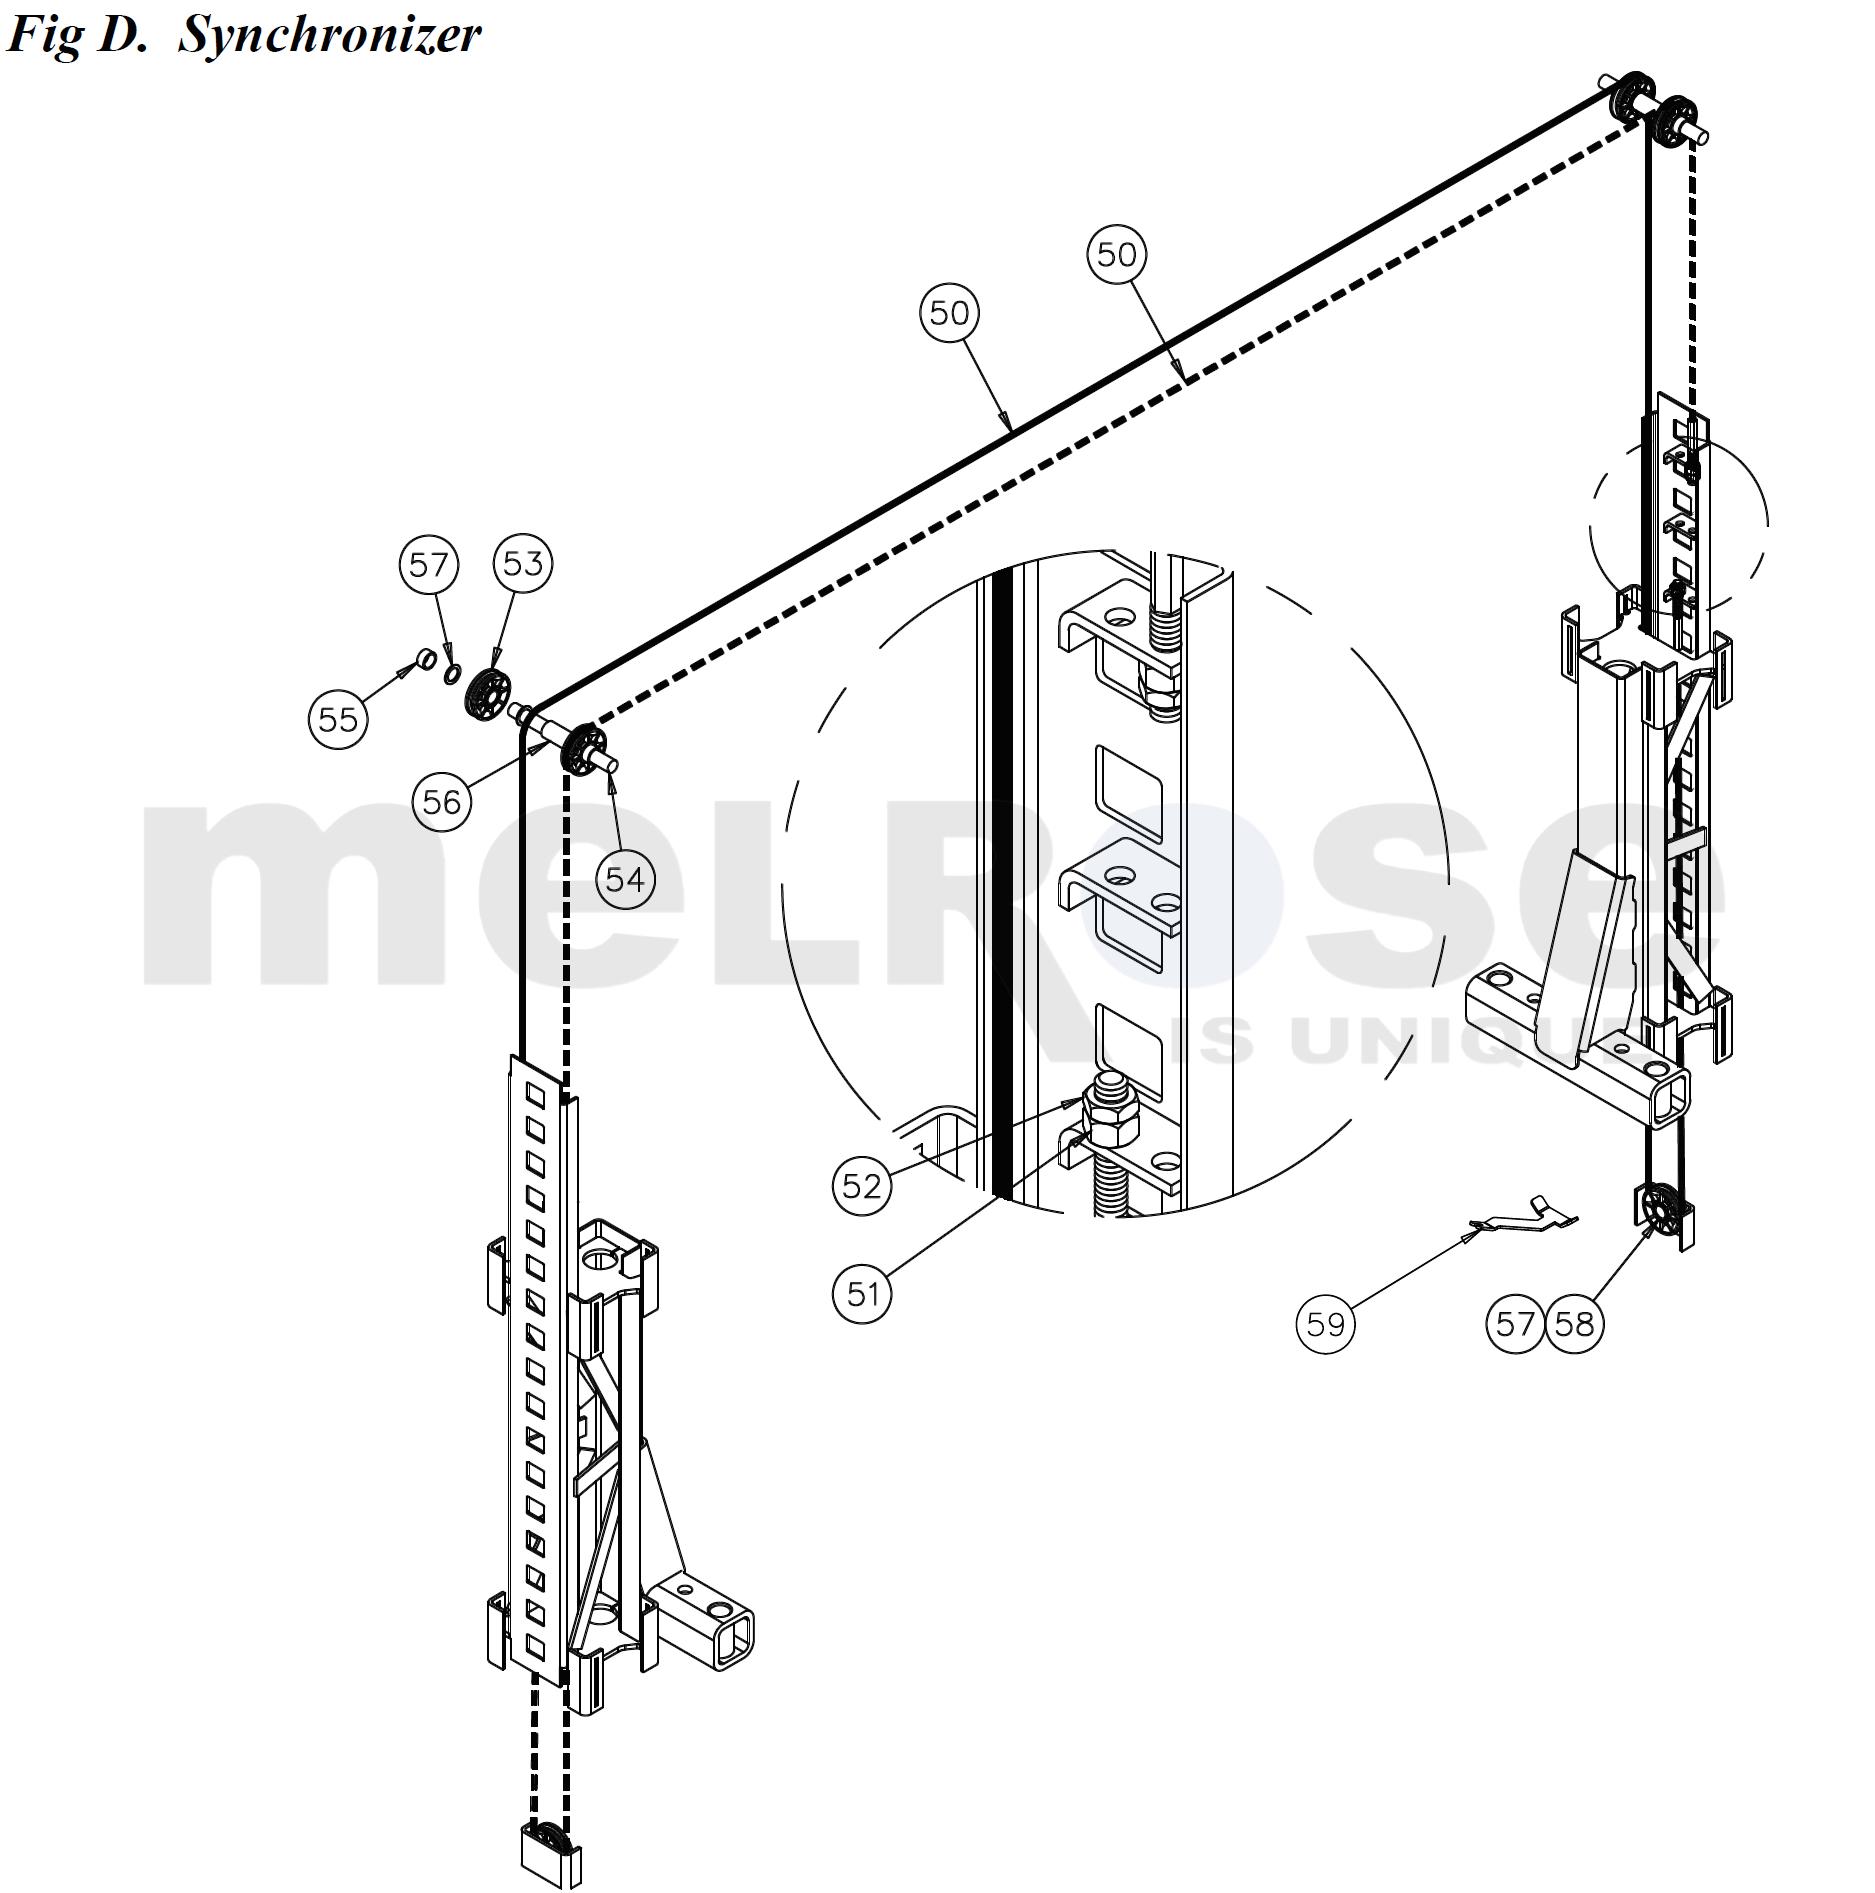 cl9-synchronizer-diagram-marked.jpg